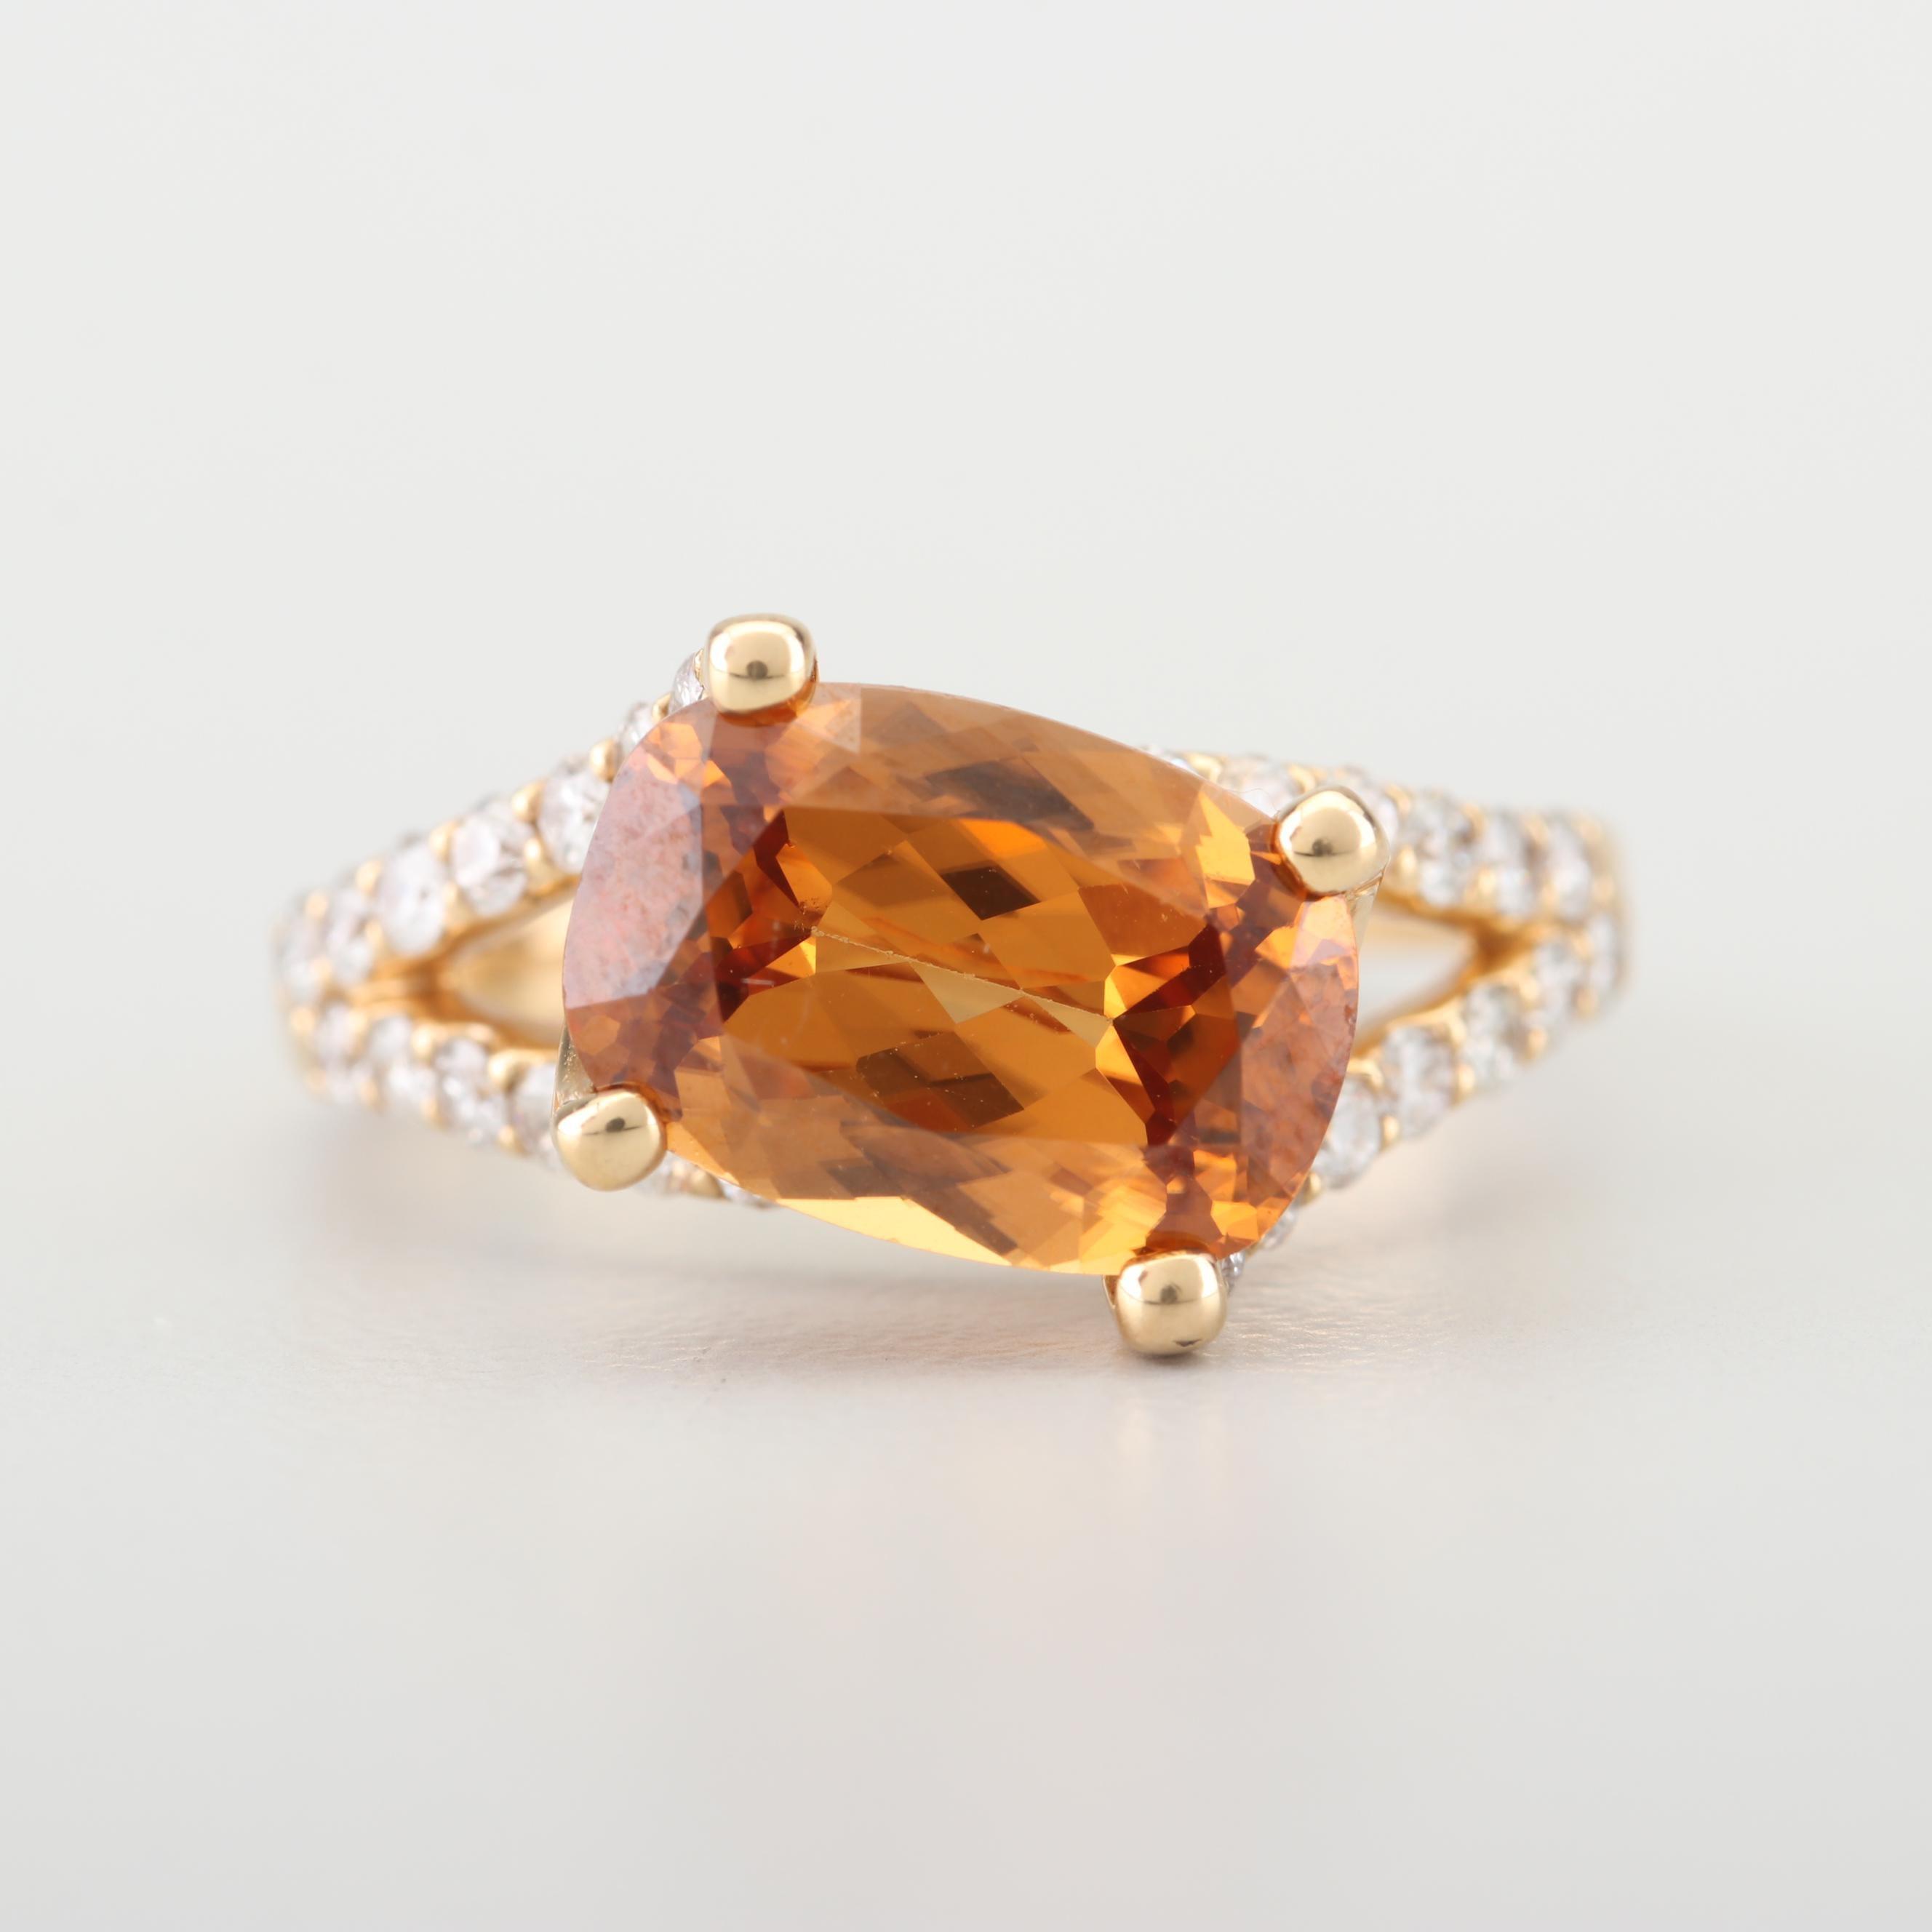 18K Yellow Gold 2.85 CT Topaz and Diamond Ring